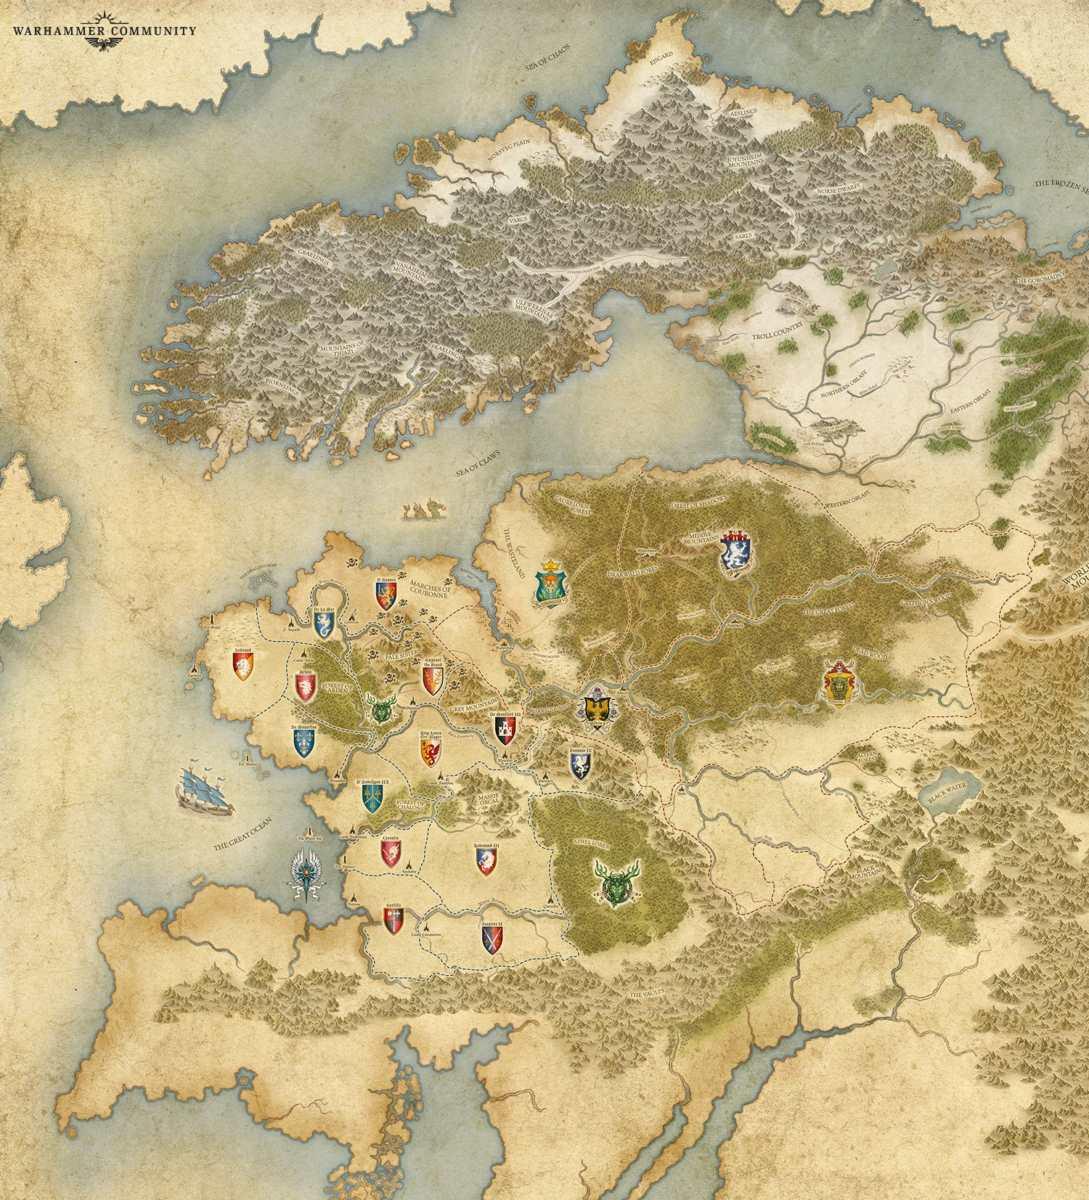 Mappa di Warhammer: The Old World